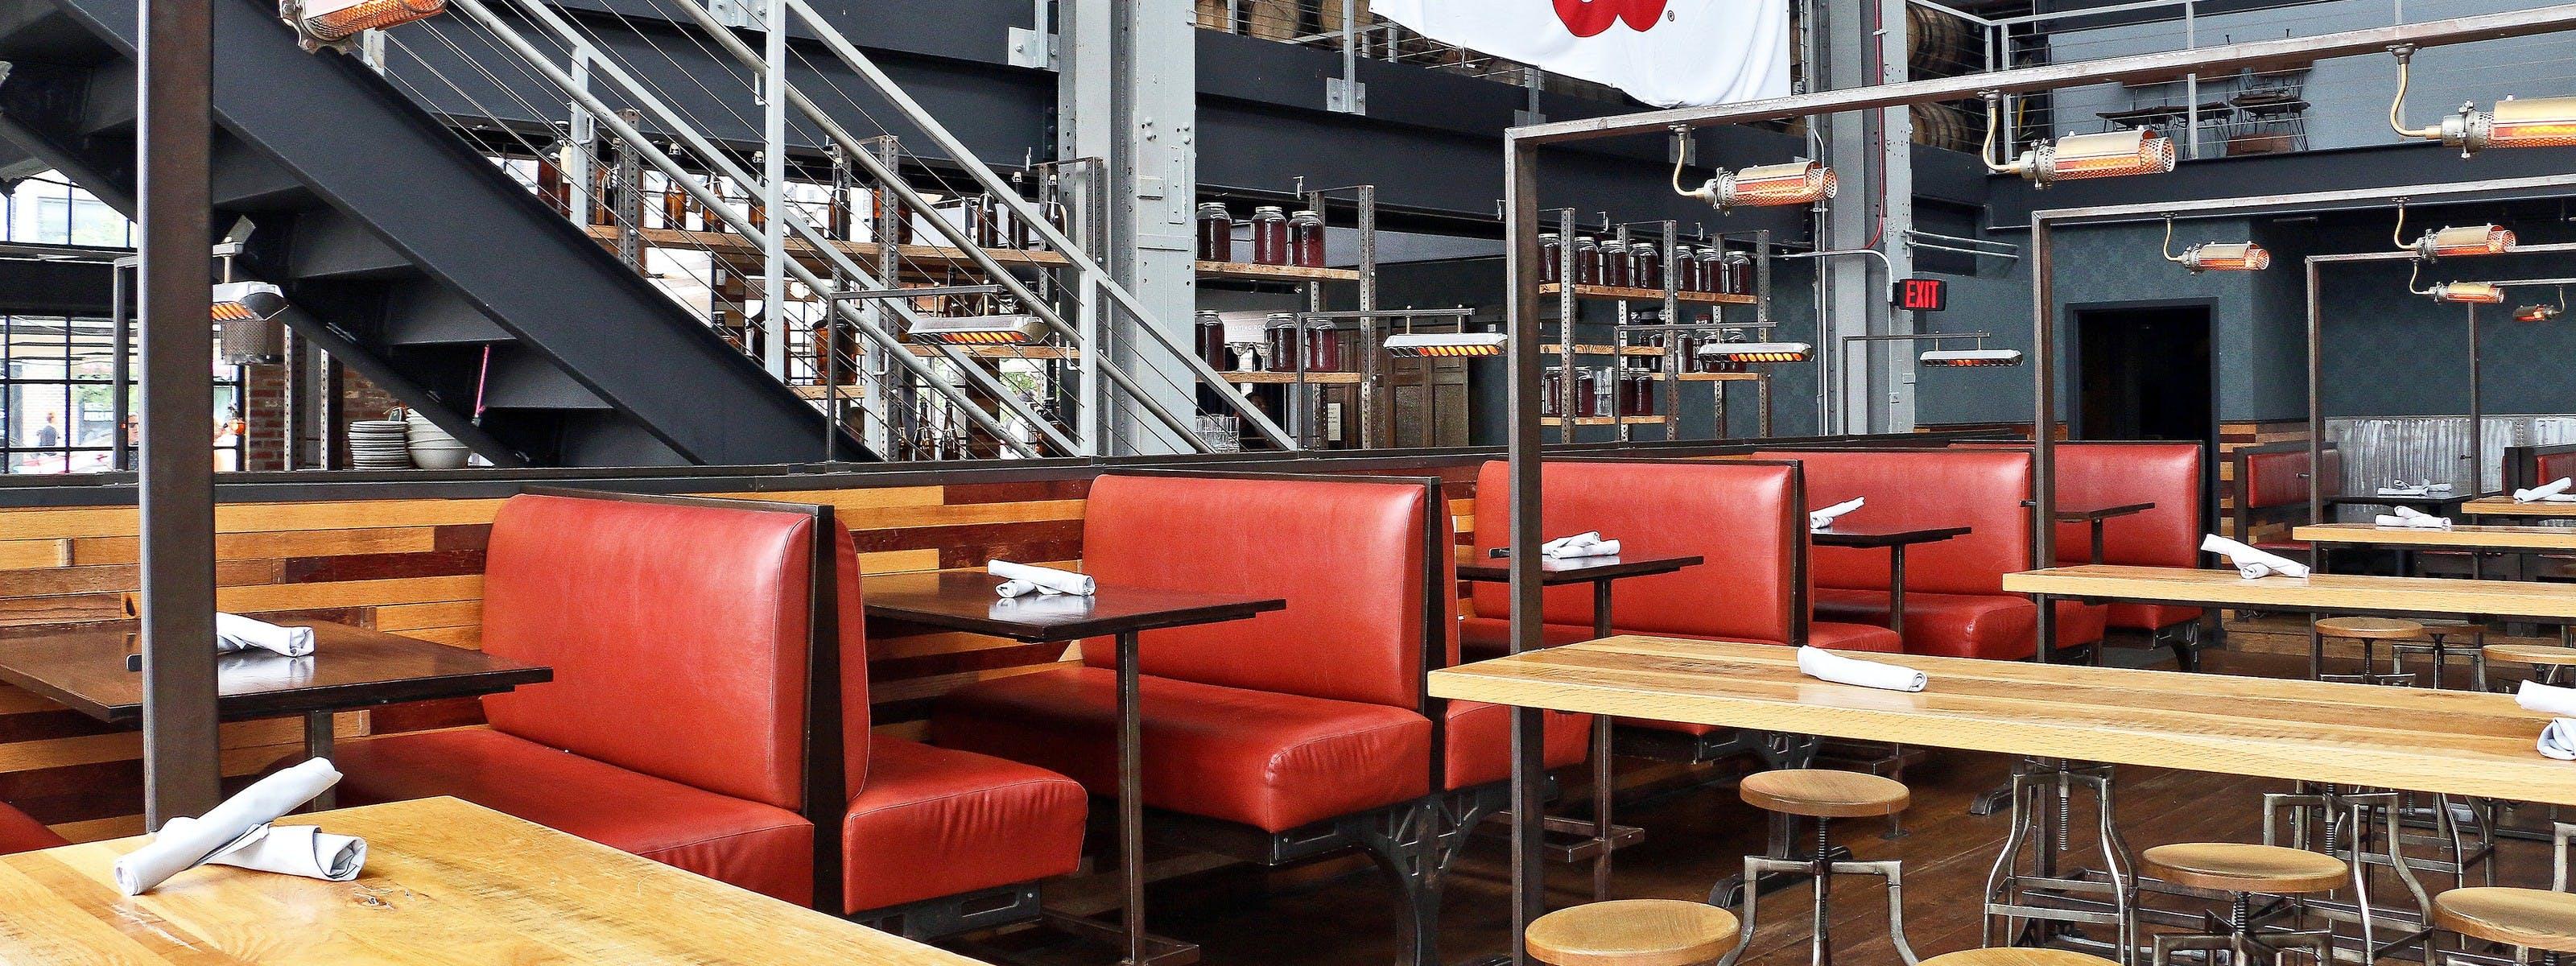 Where To Eat & Drink Around Nats Park - Navy Yard - Washington DC - The Infatuation